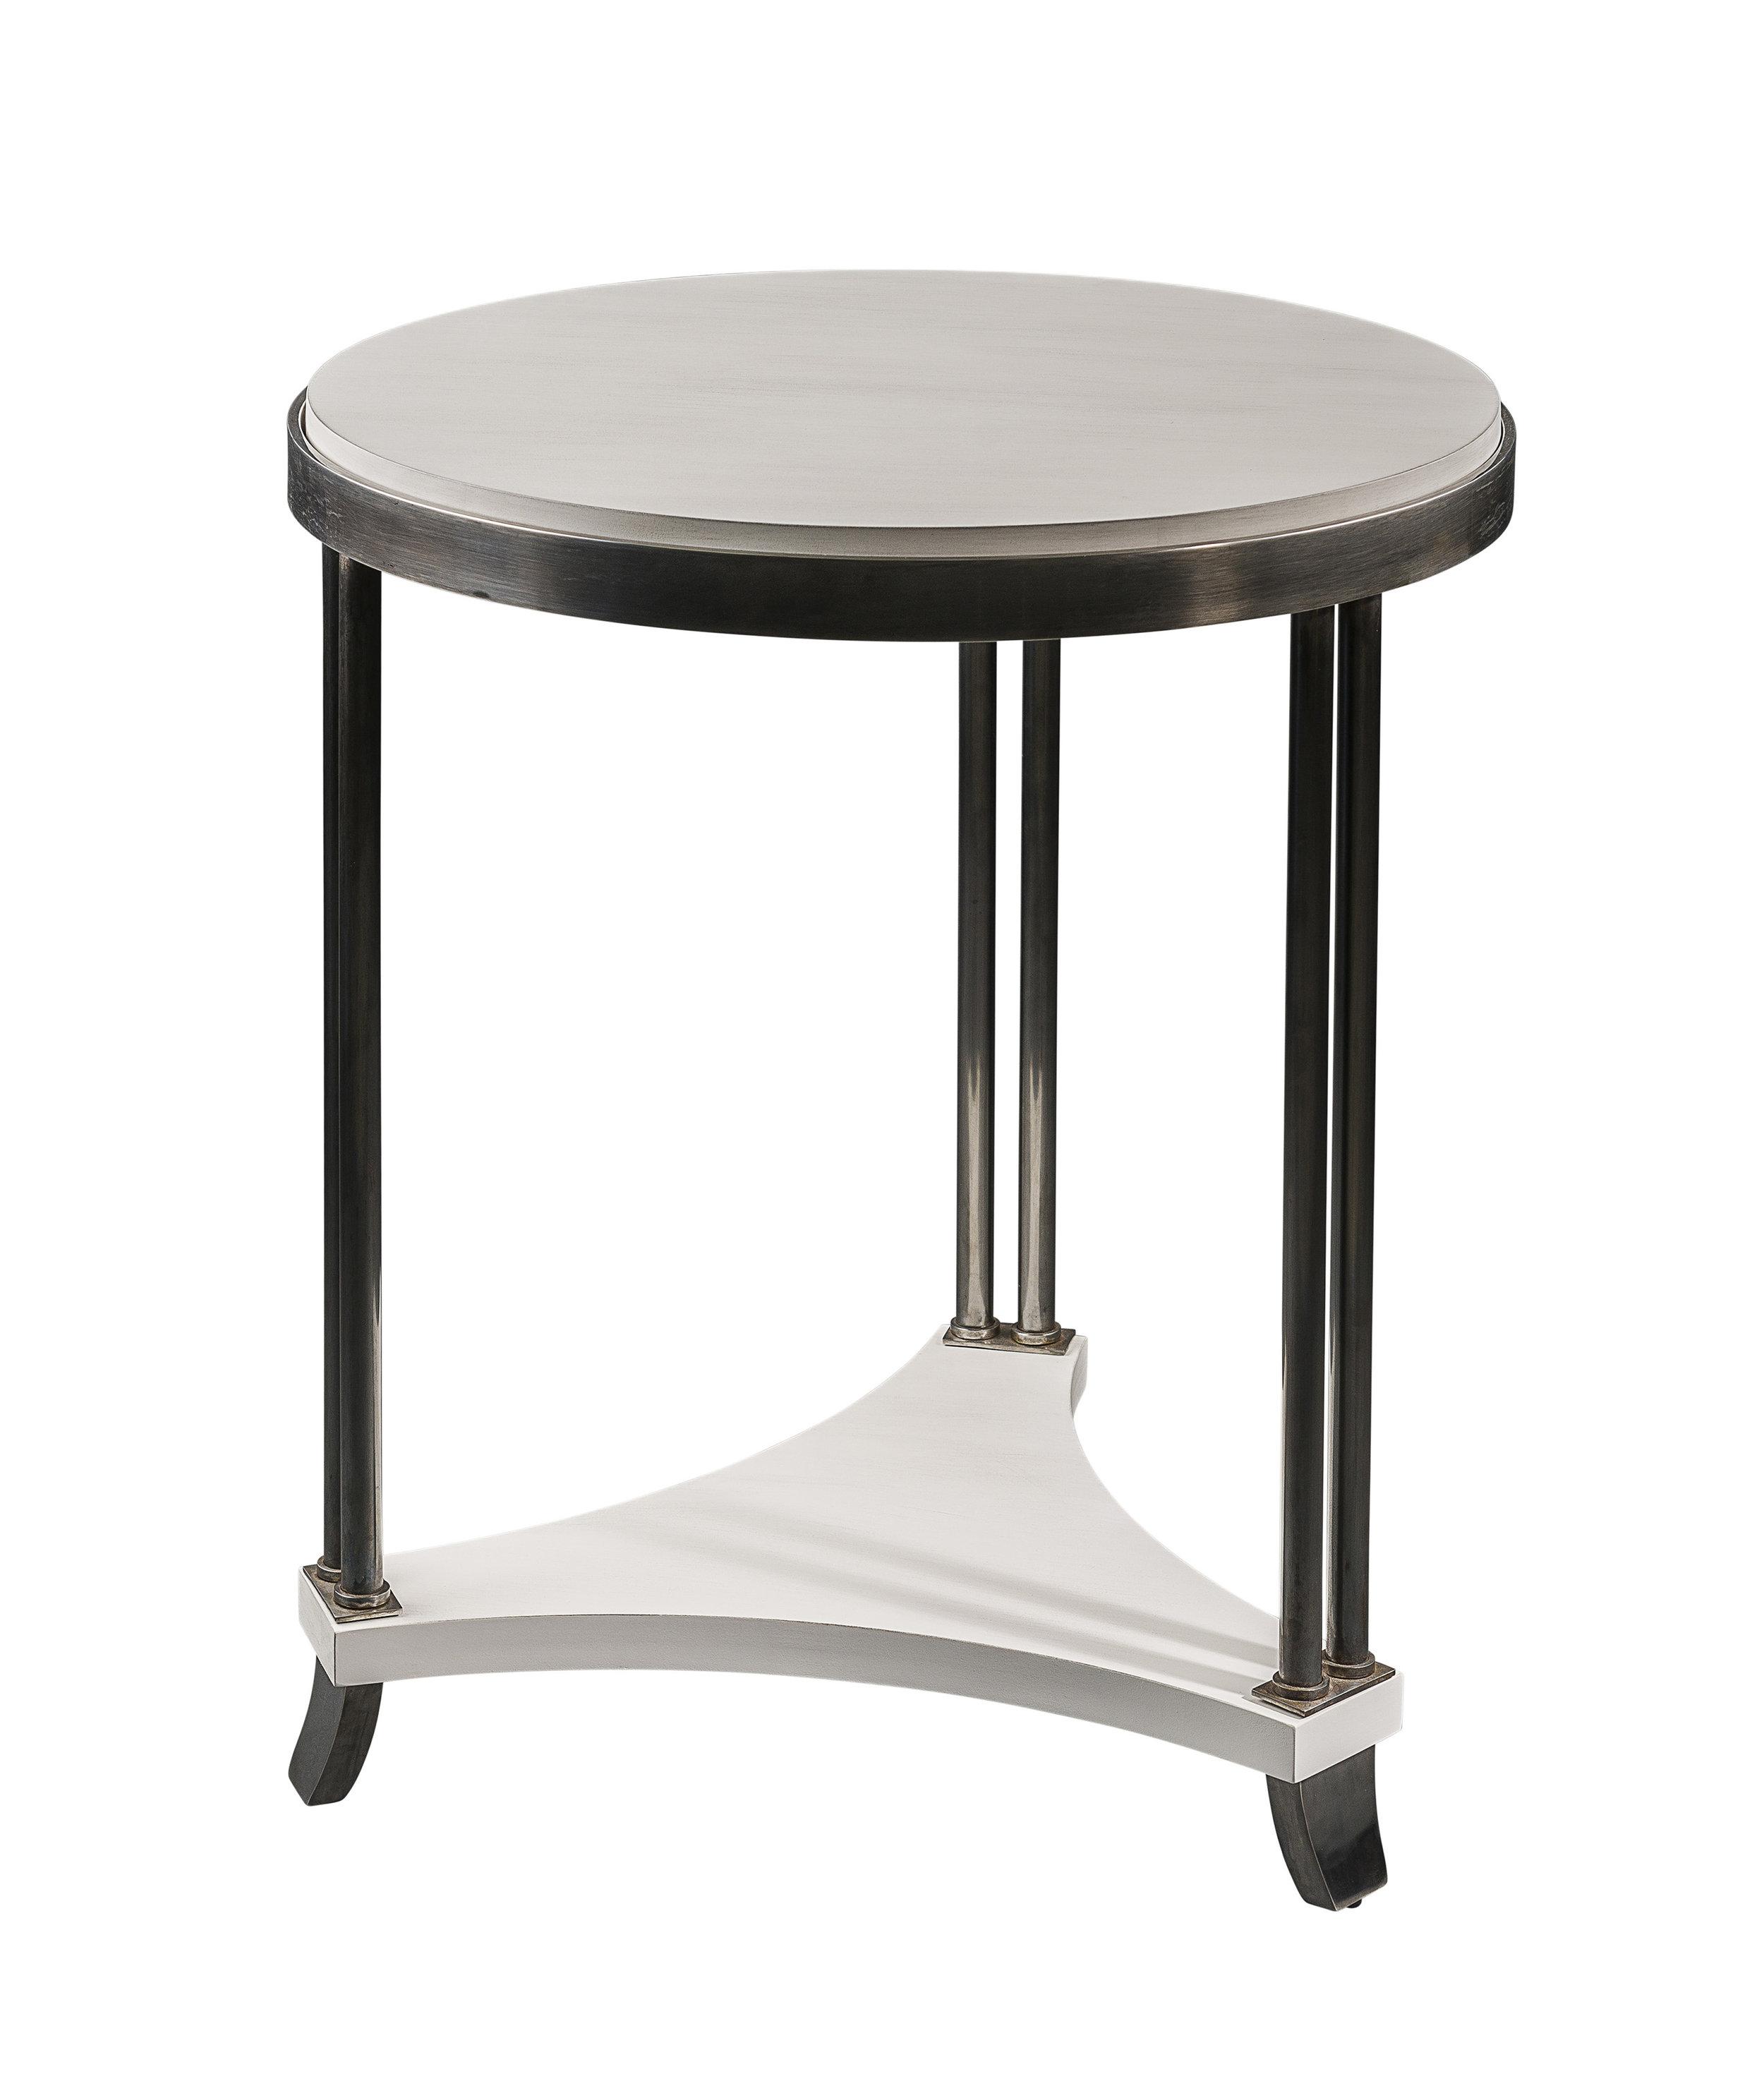 Franklin End Table copy.jpg